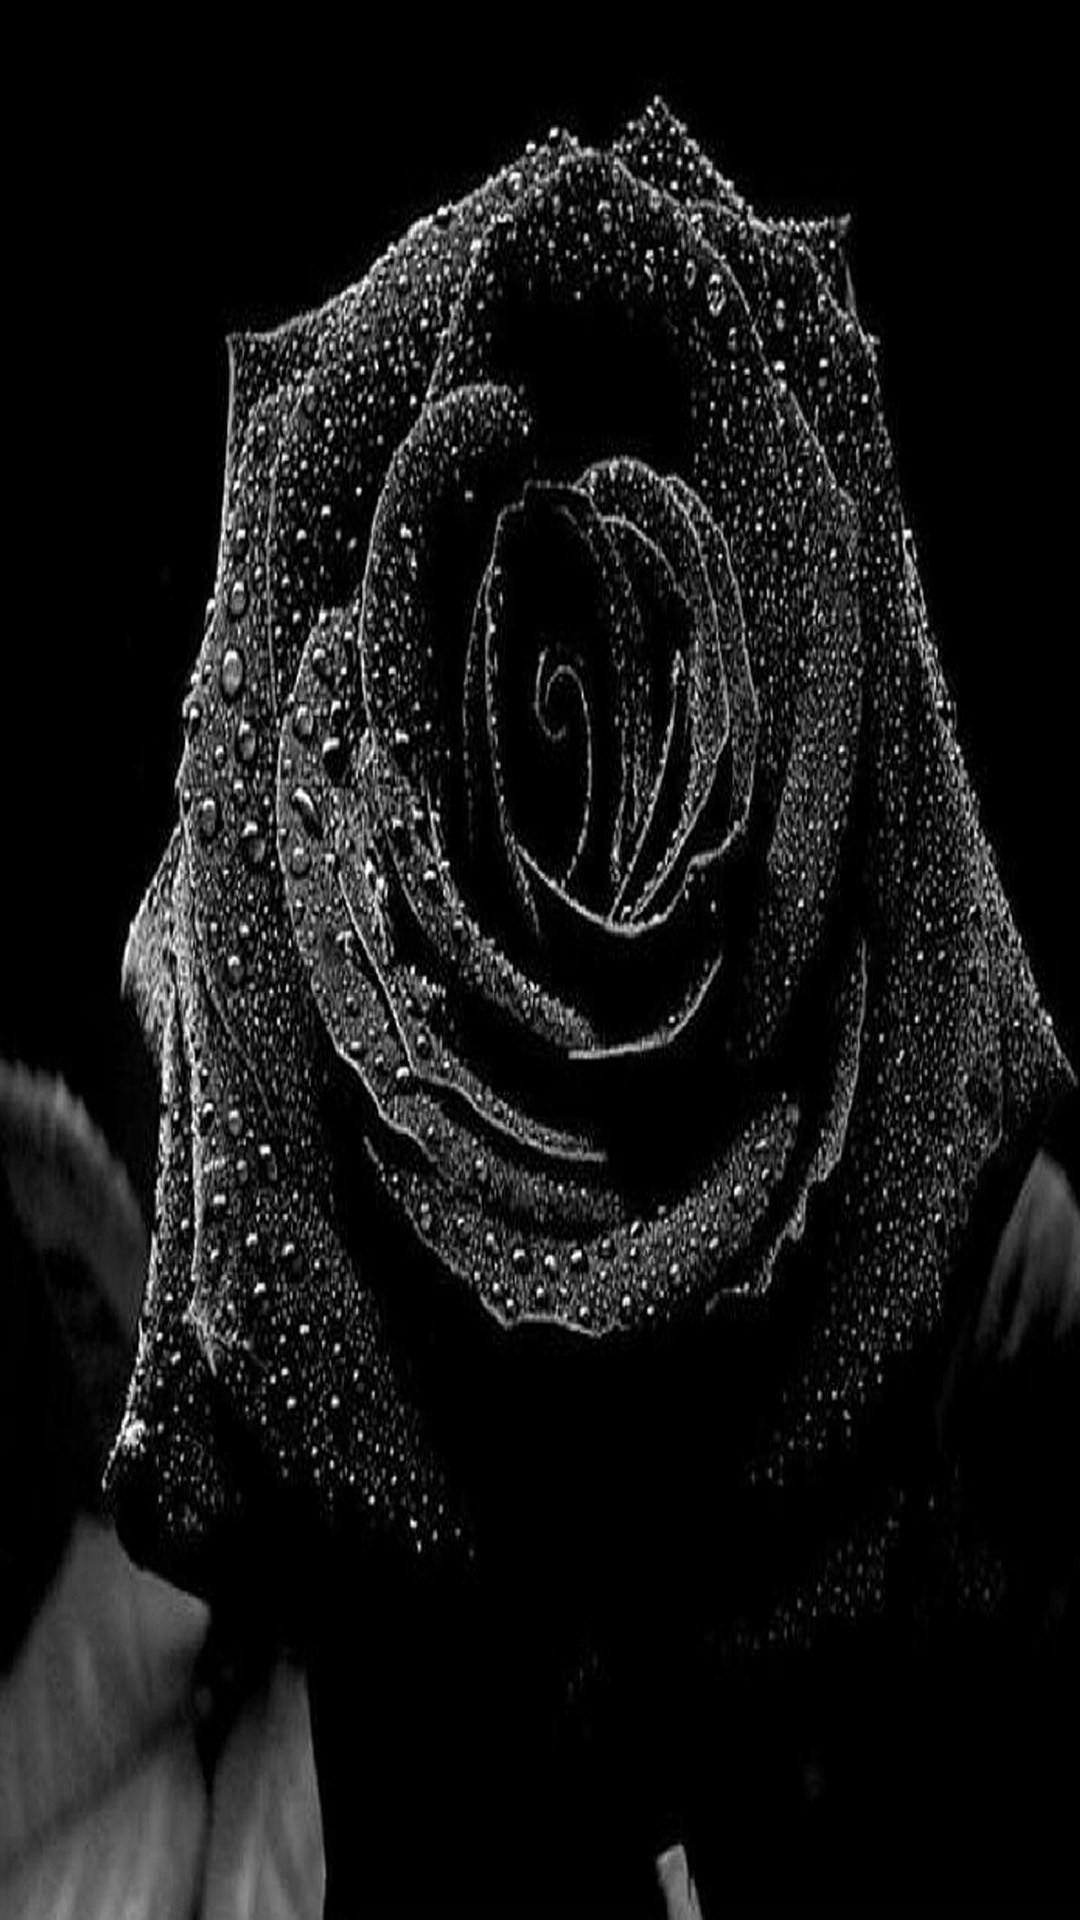 Black Roses Wallpaper (64+ images)